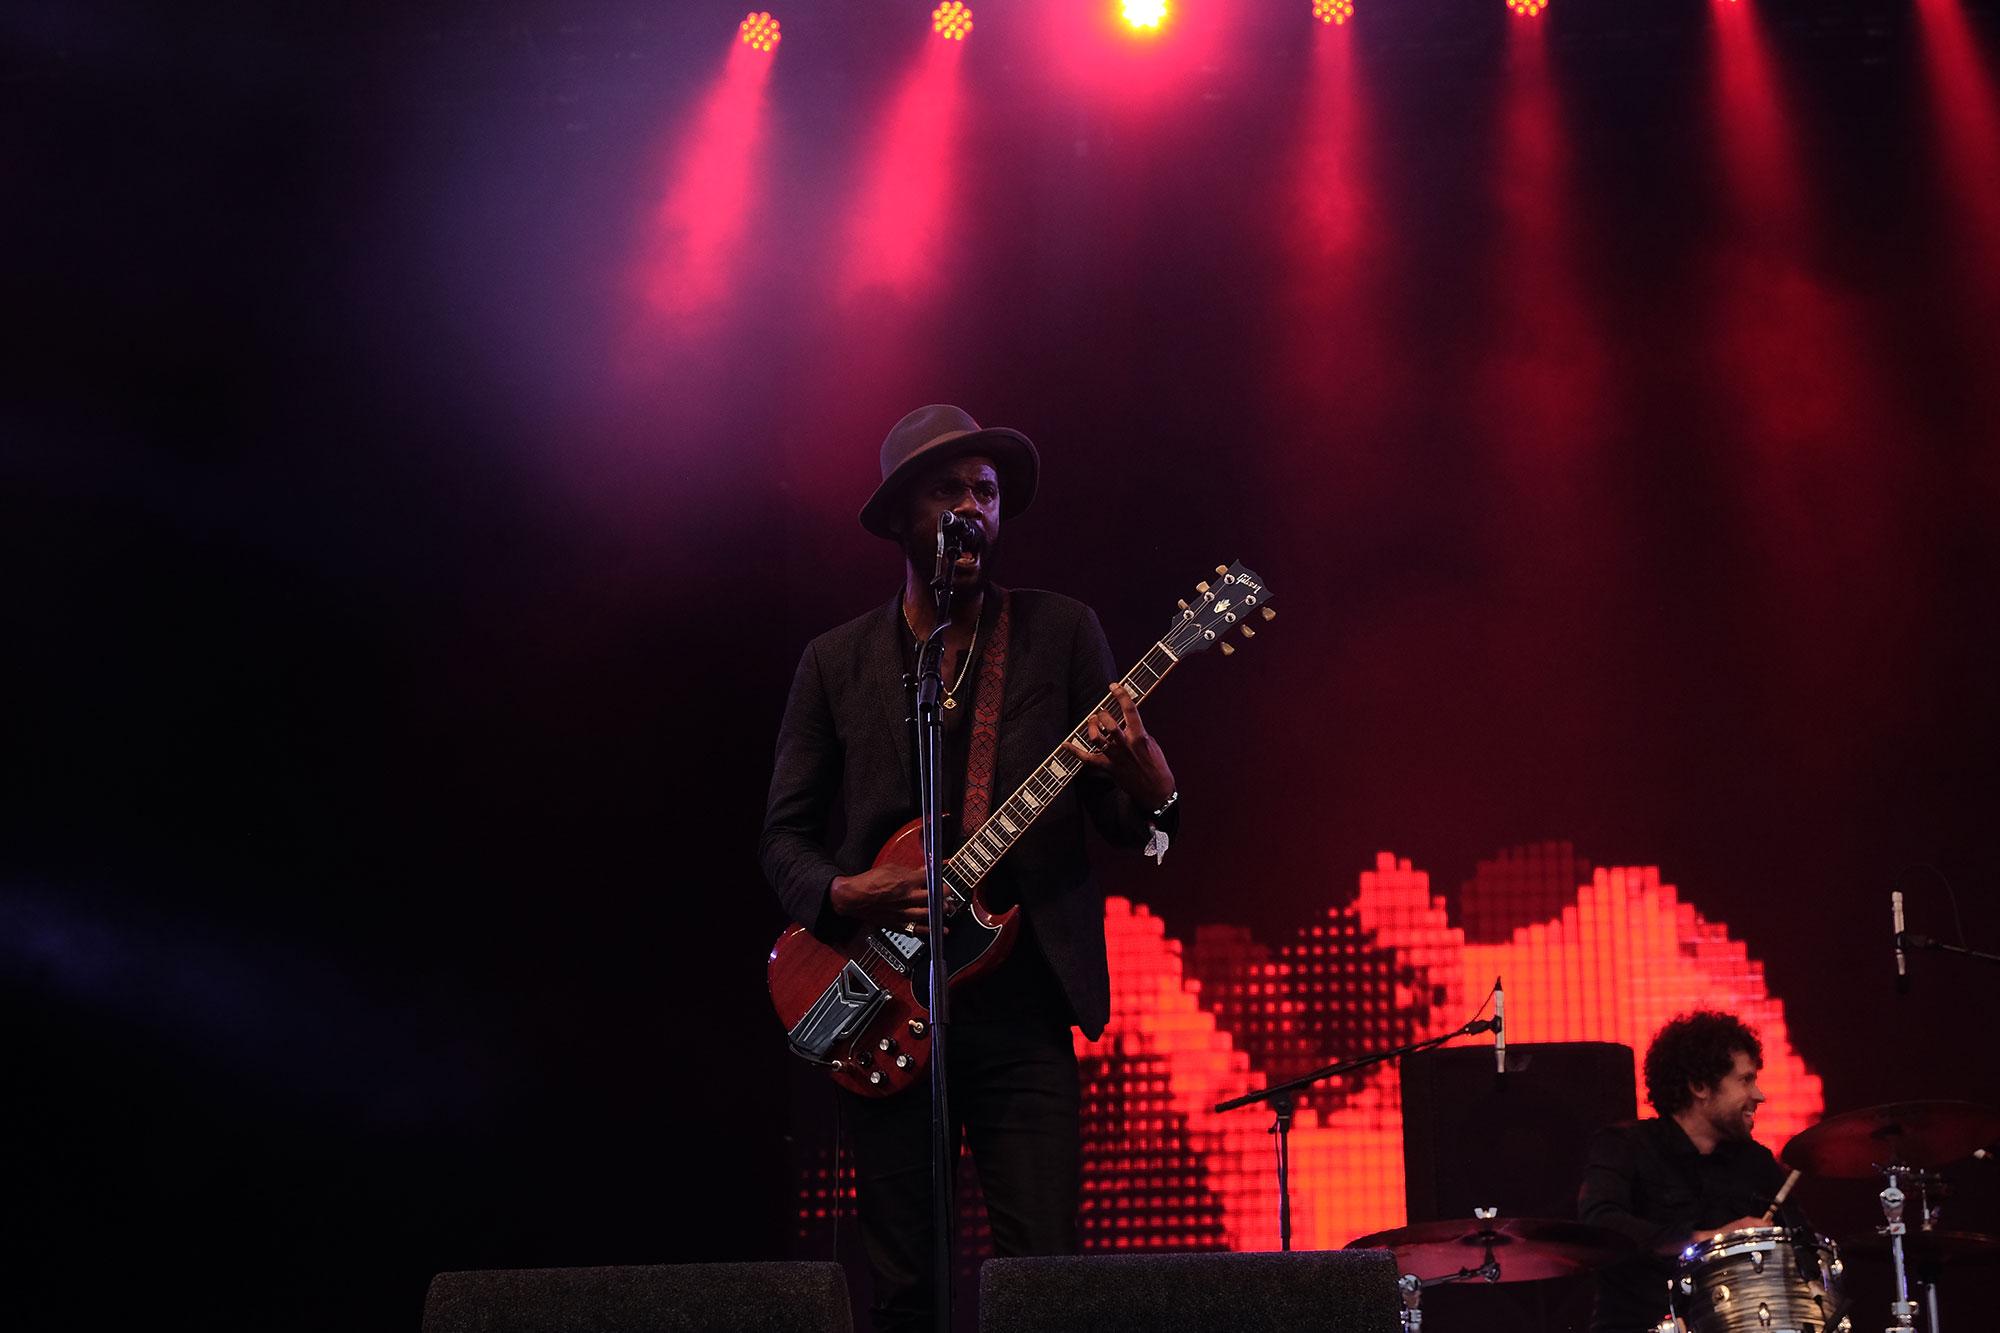 Gary Clark Jr at Glastonbury Festival, 2016